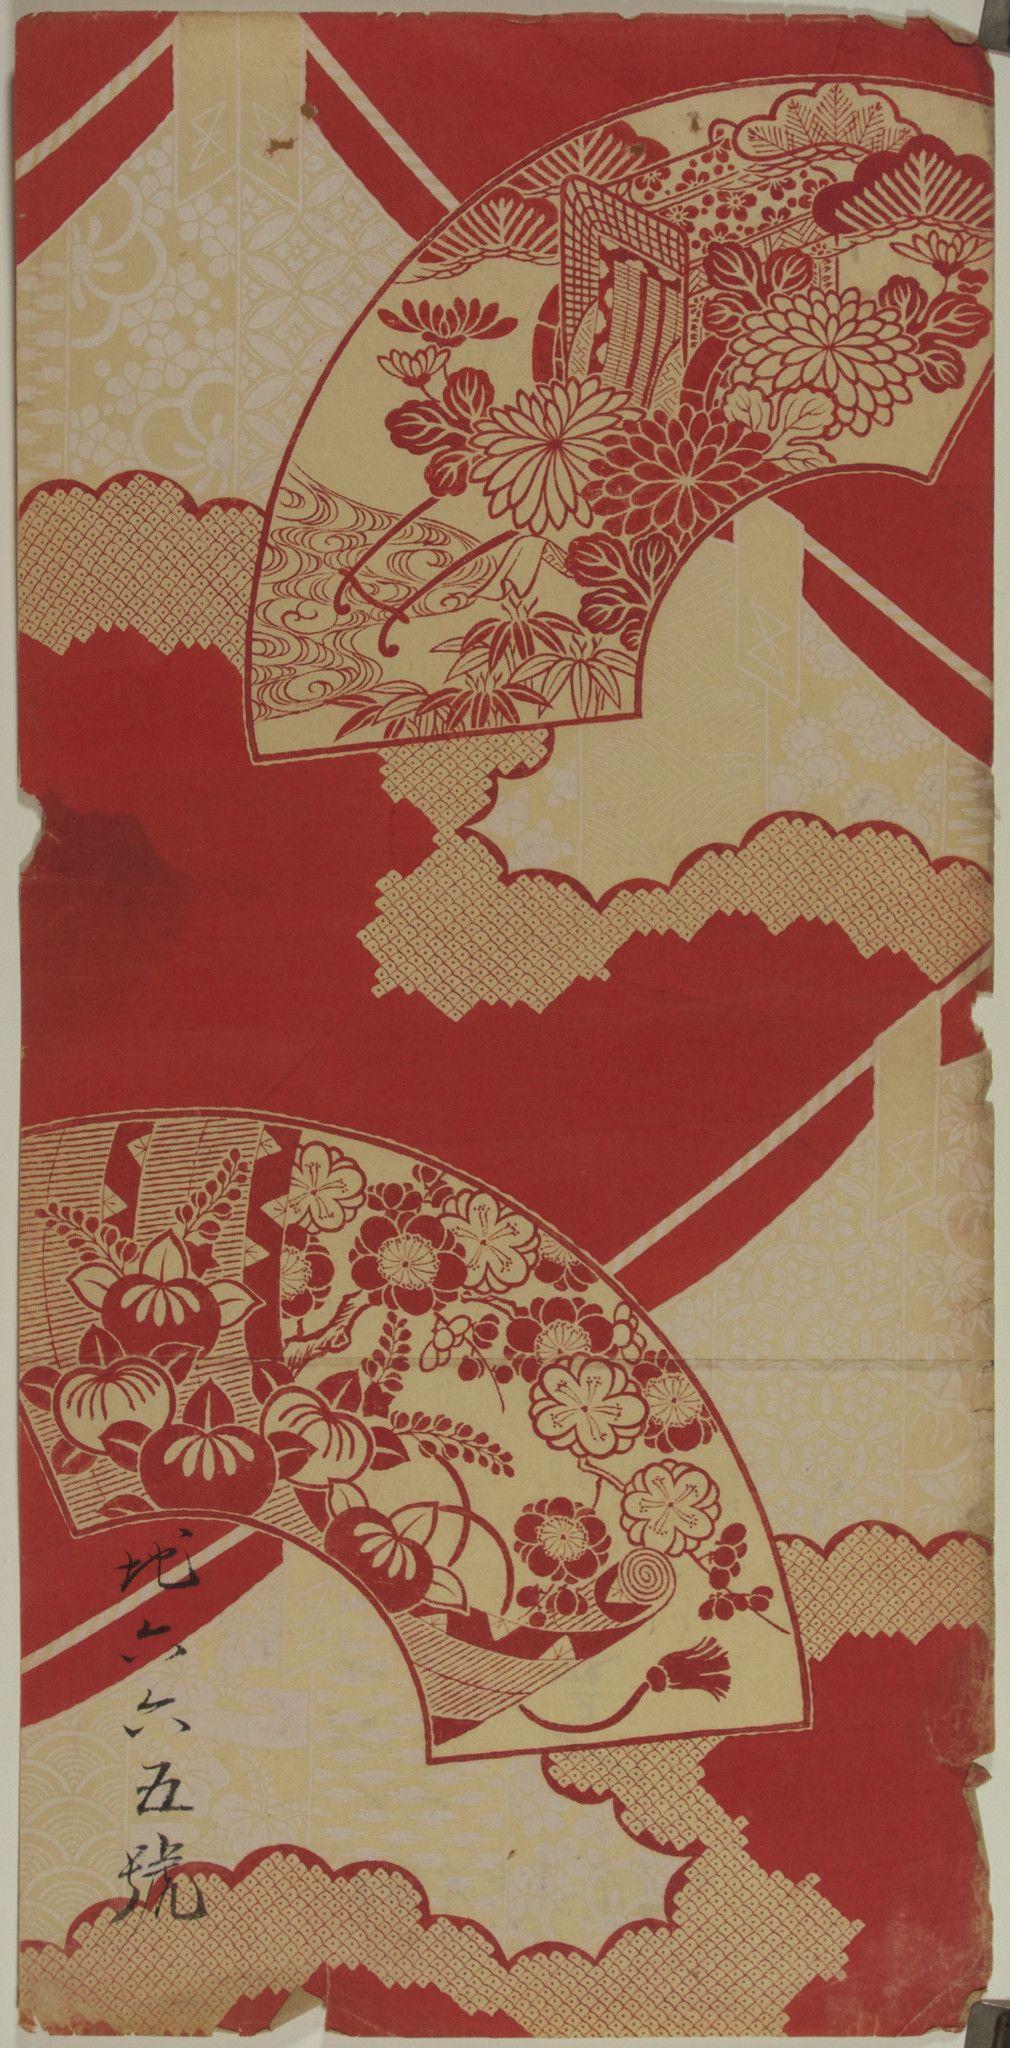 Japanese Textile Design Pattern Art Dissertation Binding Manchester